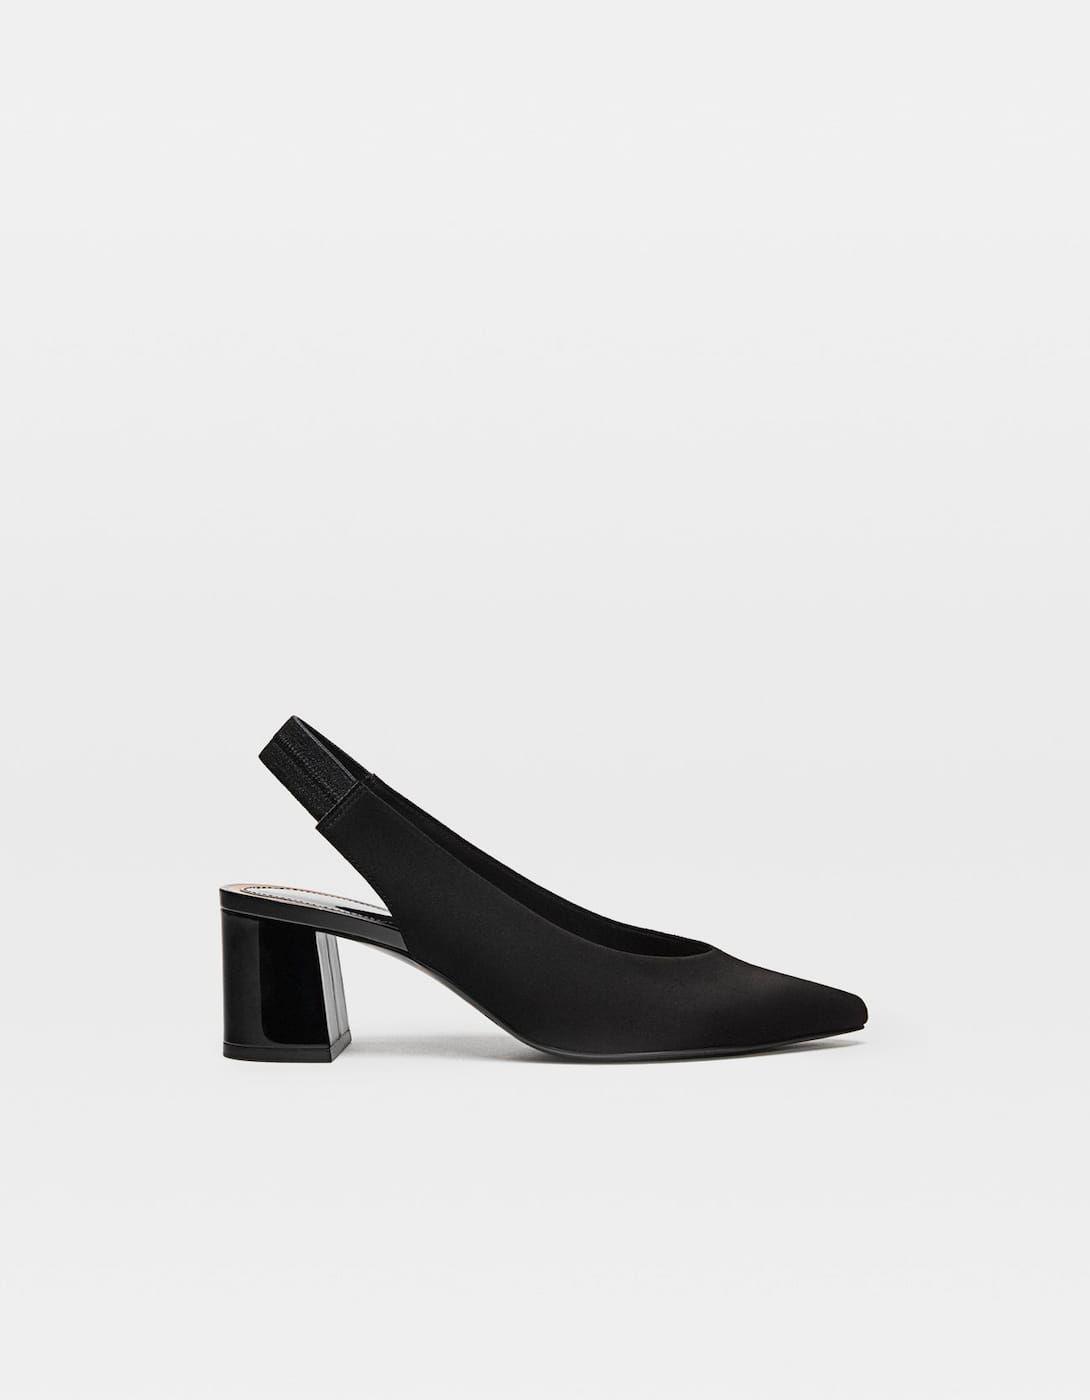 Black Slingback Shoes Just In Stradivarius United Kingdom Shoes Slingback Shoes Slingback